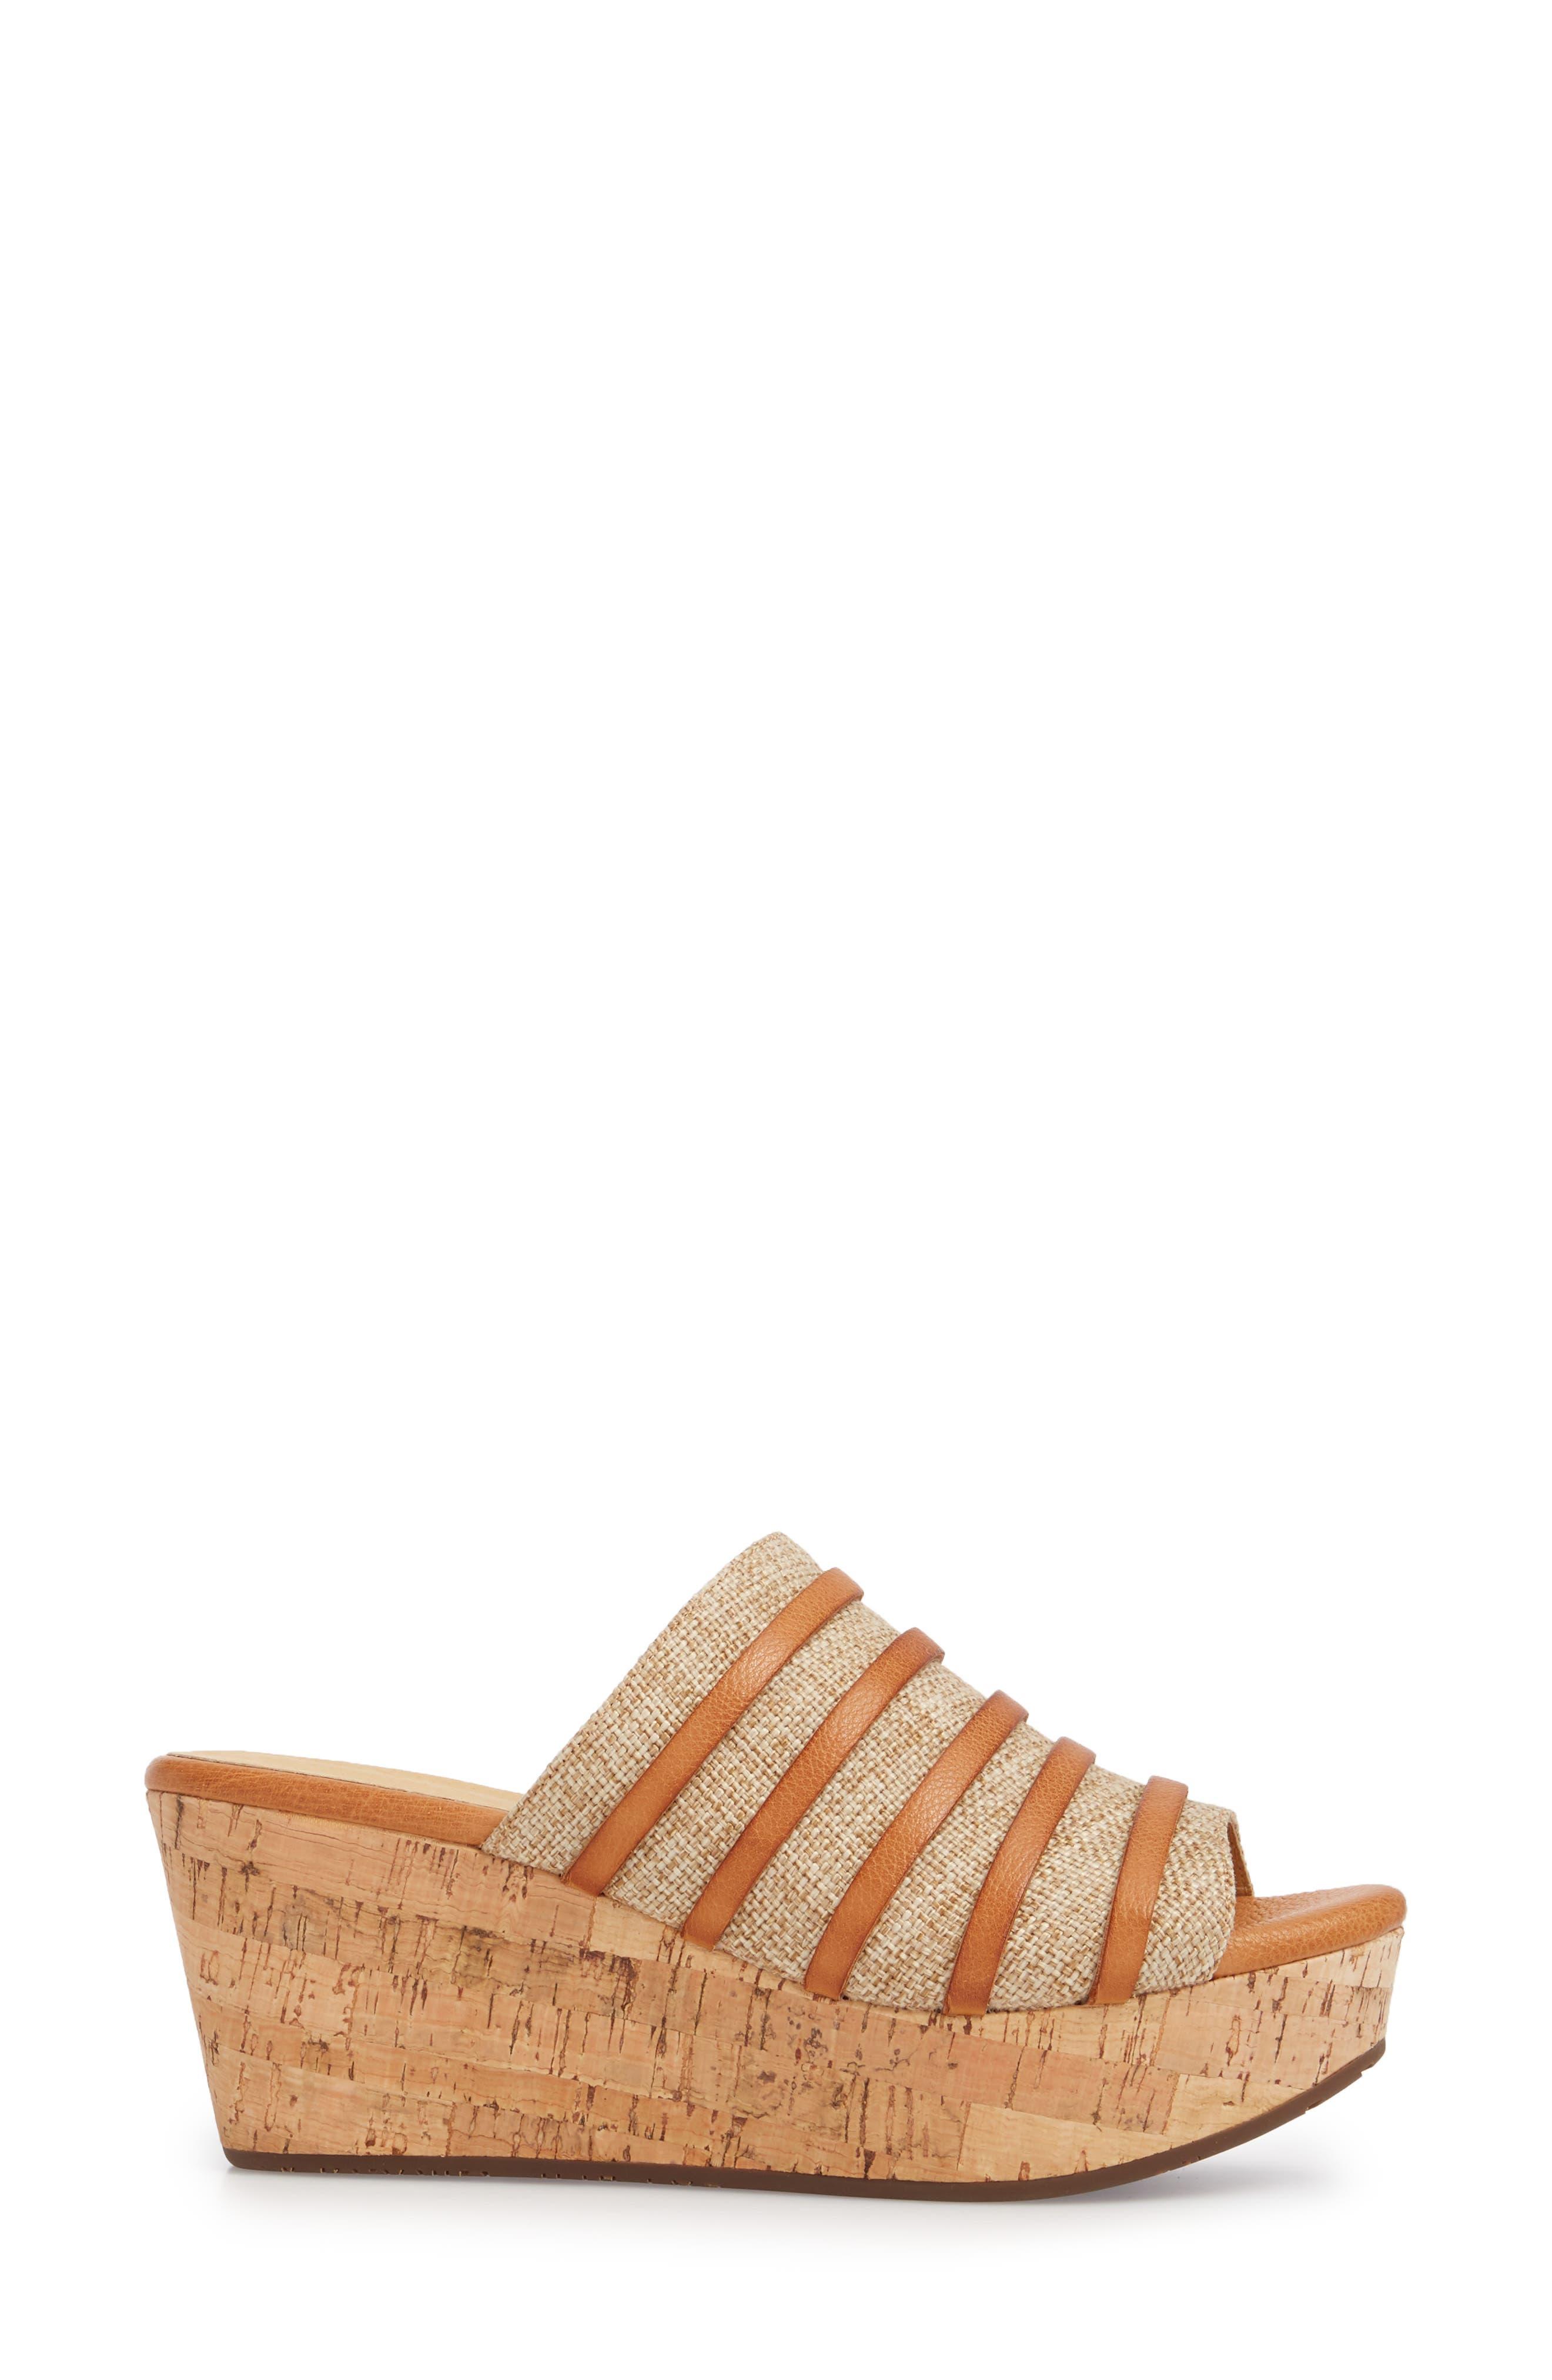 Wapi Wedge Sandal,                             Alternate thumbnail 3, color,                             Camel Leather